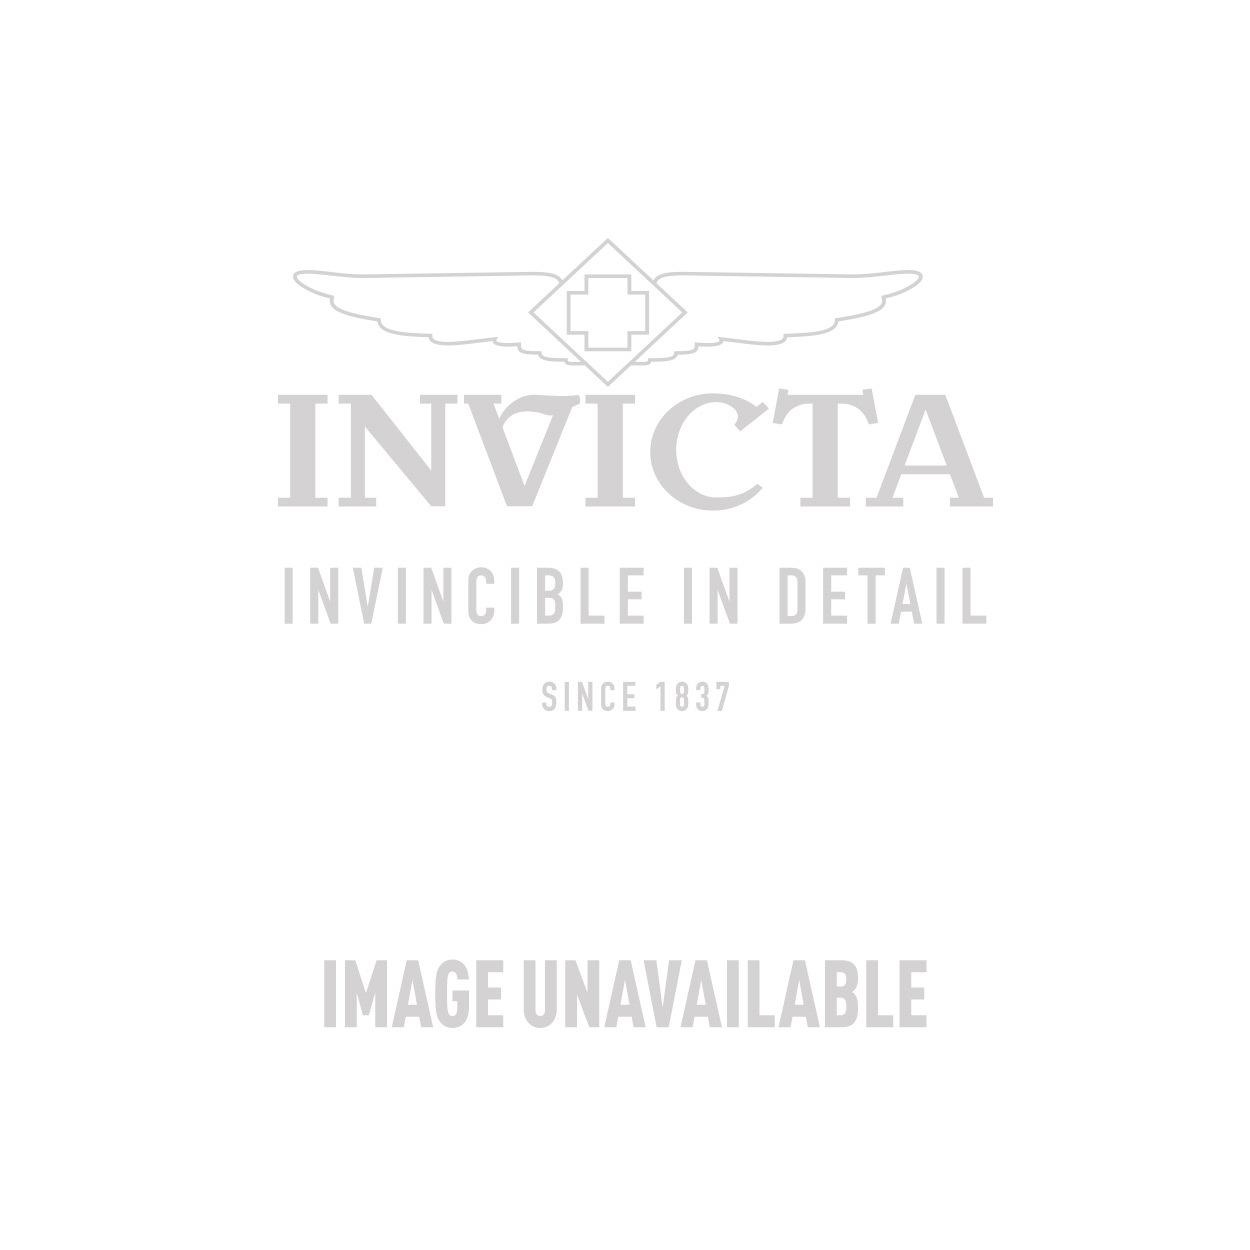 Invicta DNA Mens Quartz 46mm Stainless Steel Case Grey, Black Dial - Model 25046